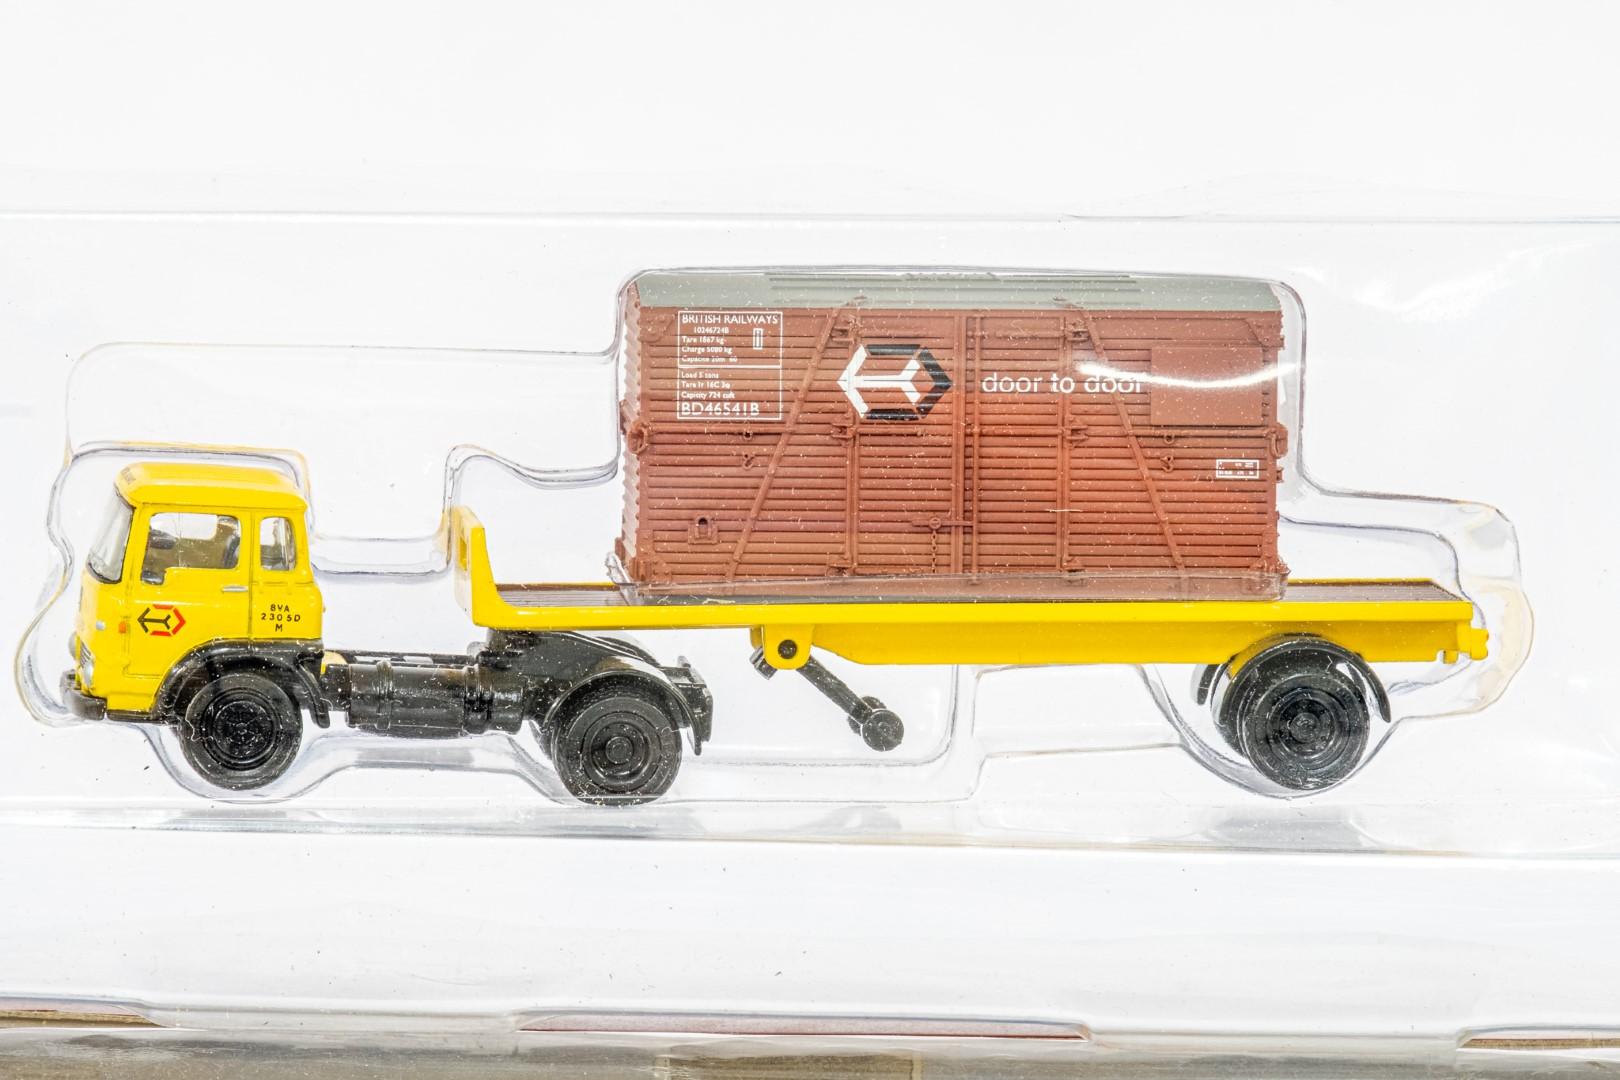 Gilbow Bedford TK Artic - British Railways - Image 3 of 3